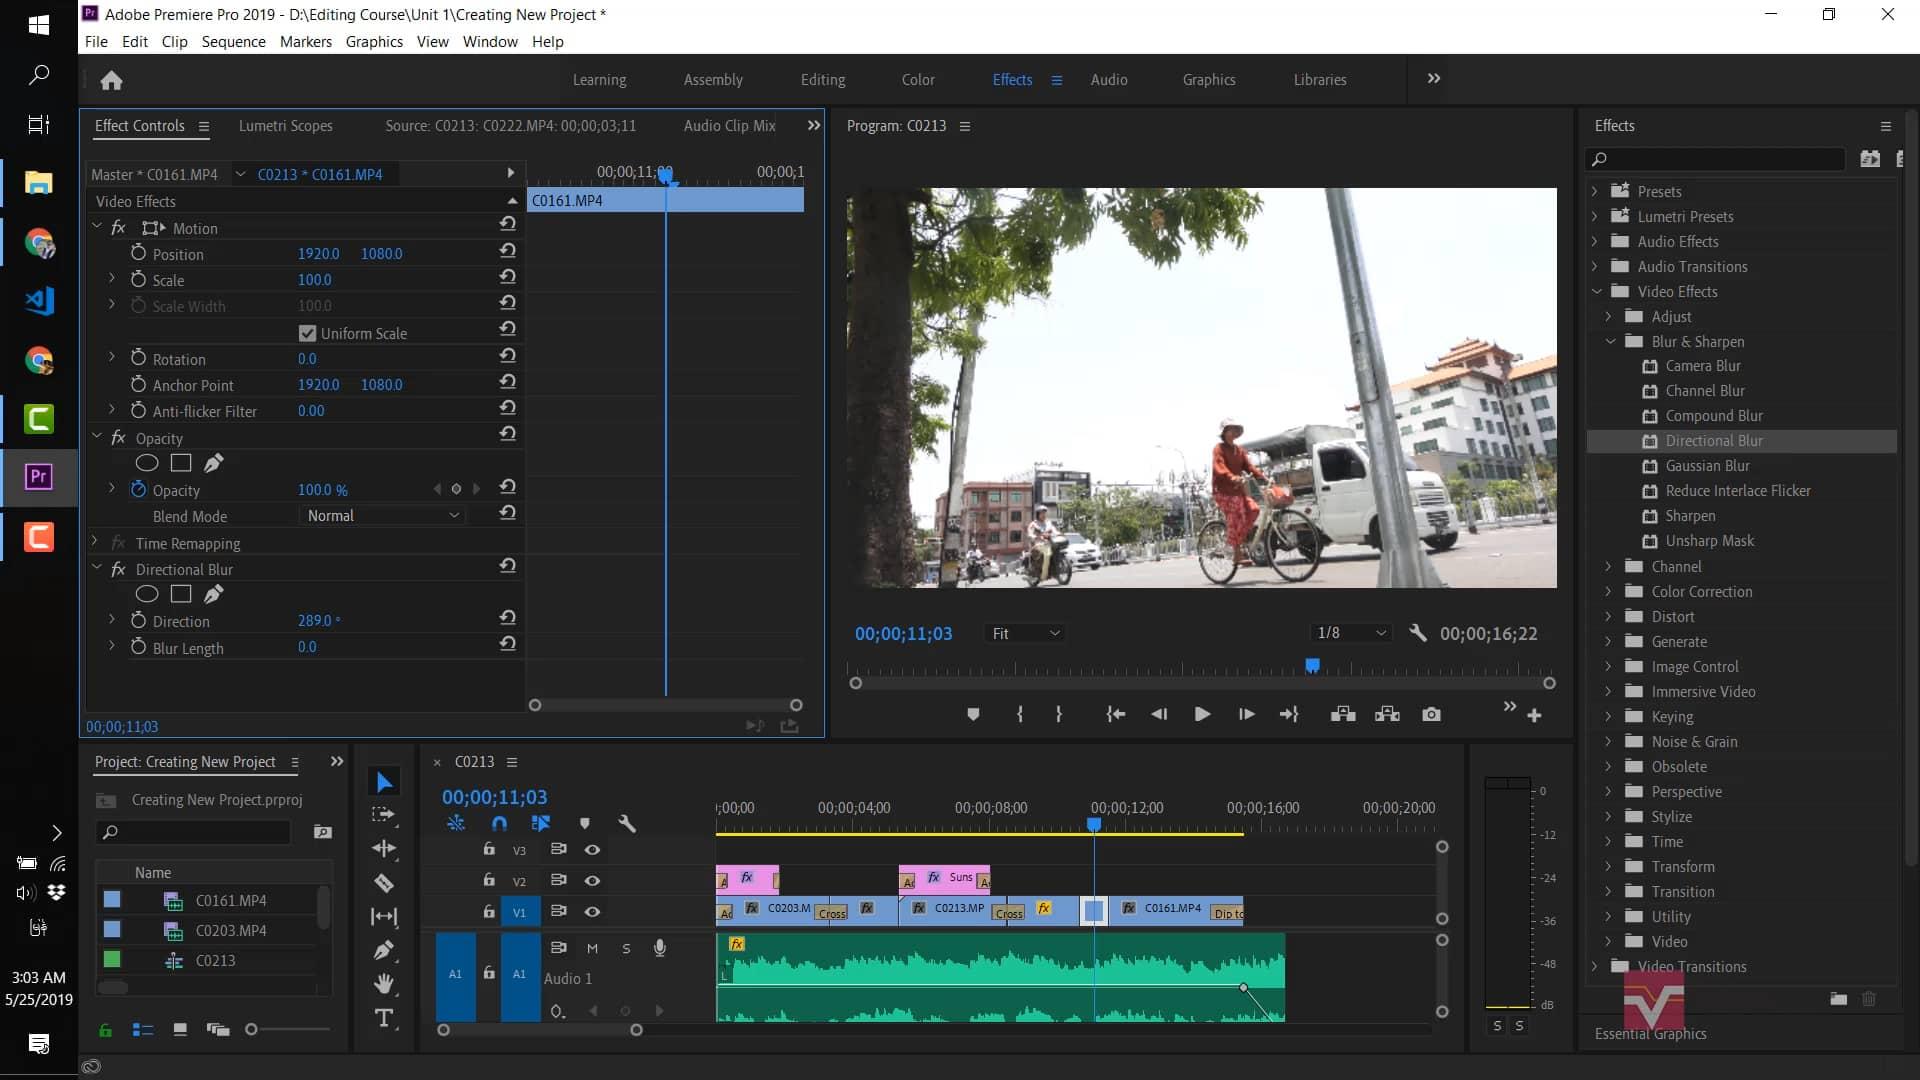 ၃.၀ Blur Video Effect အသုံးပြုခြင်း